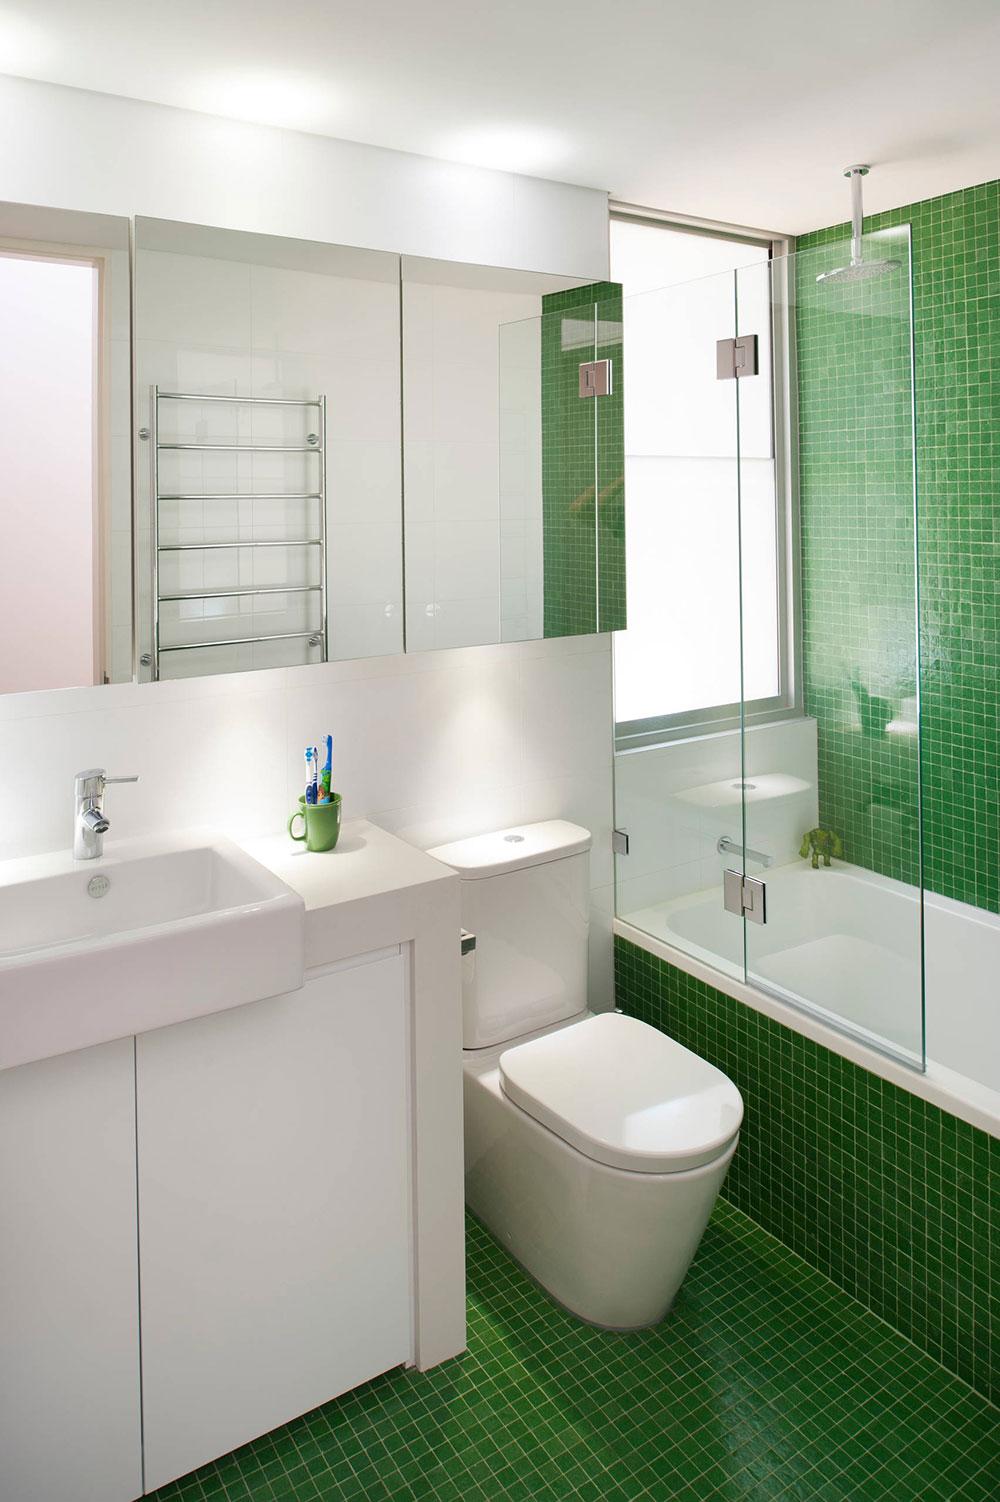 дизайн ванной комнаты фото 15